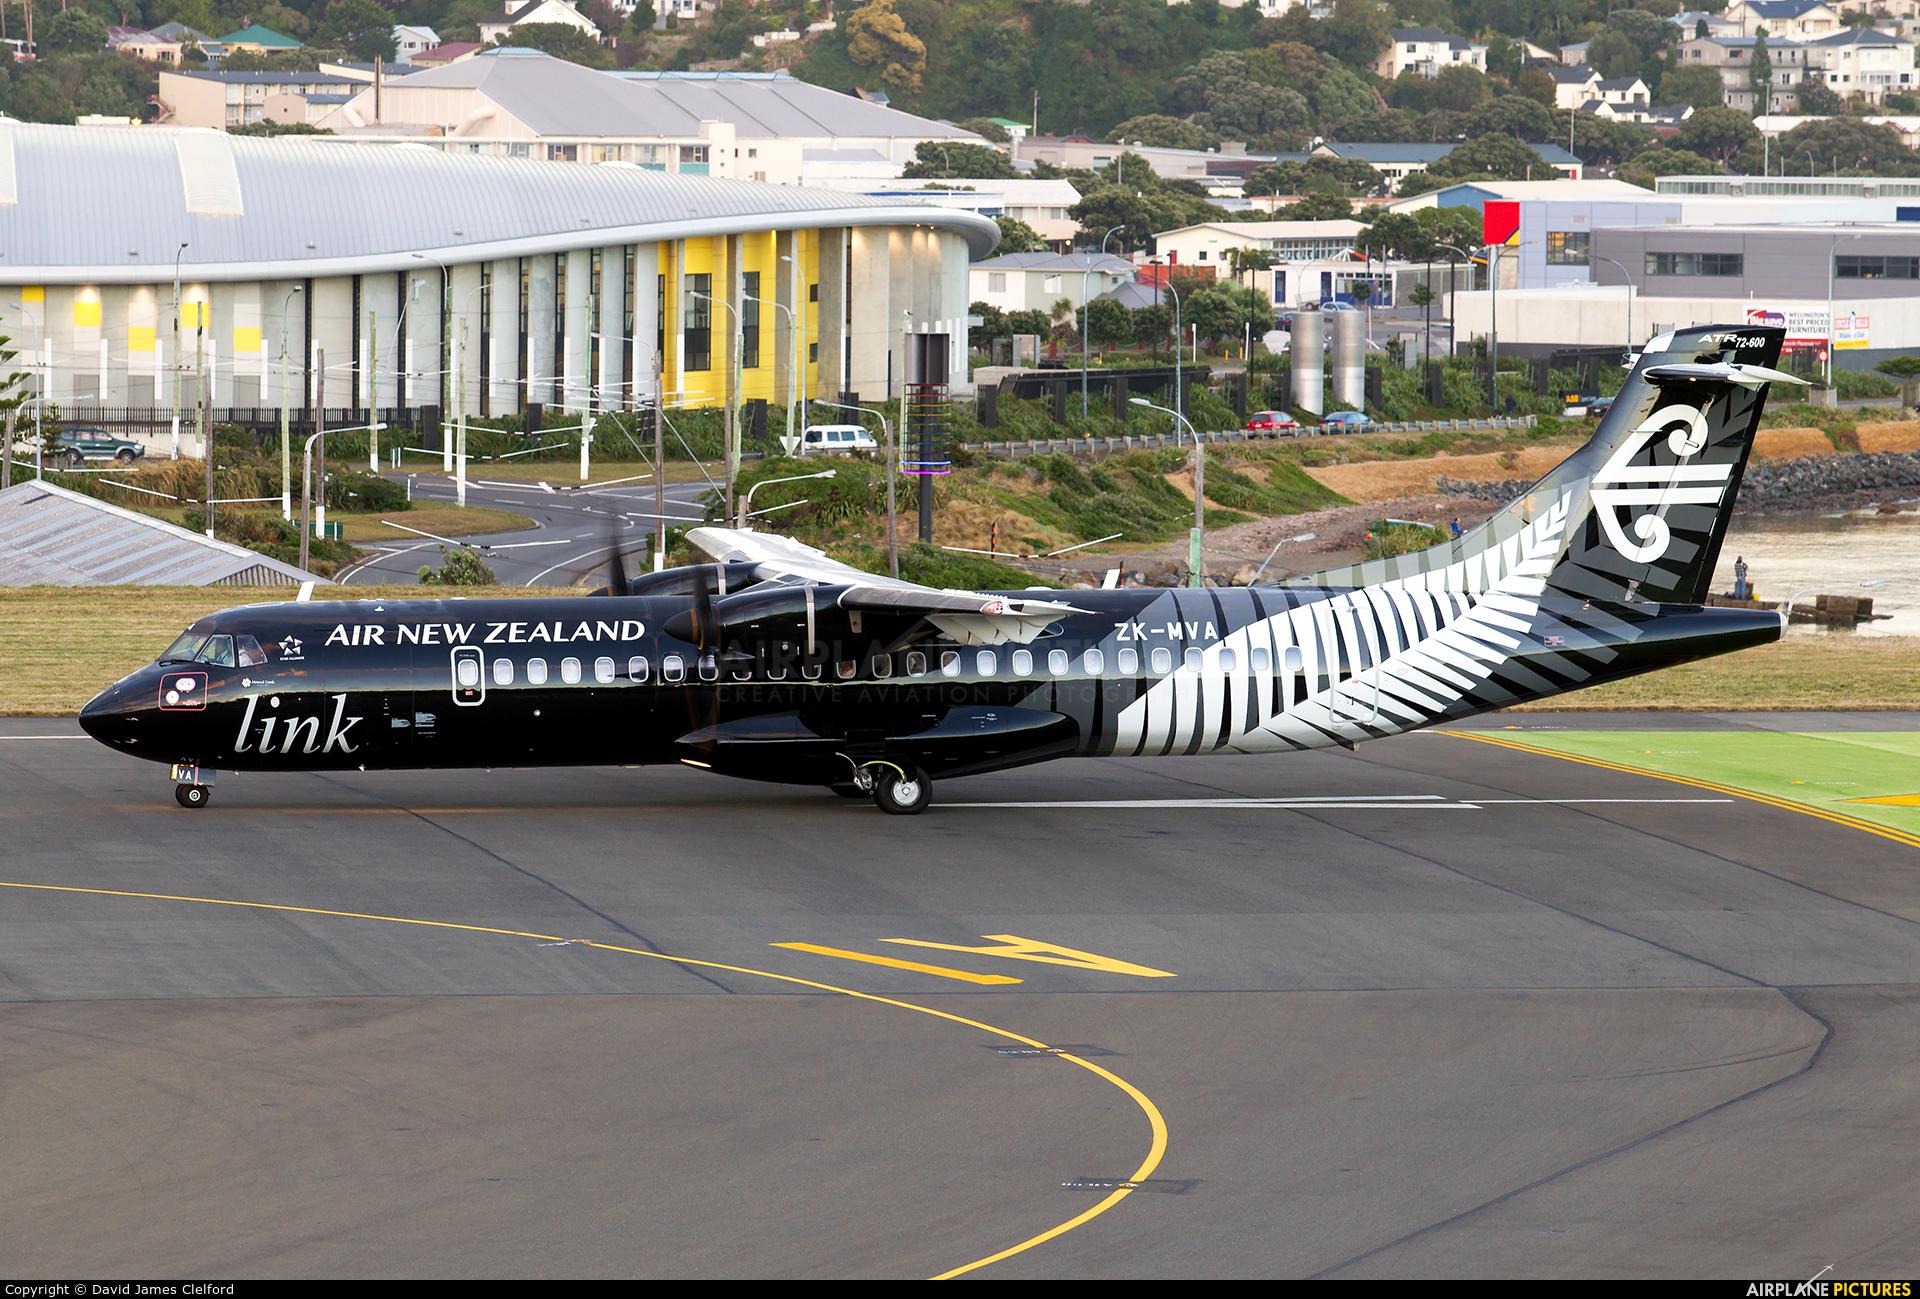 Air New Zealand Link - Mount Cook Airline ZK-MVA aircraft at Wellington Intl